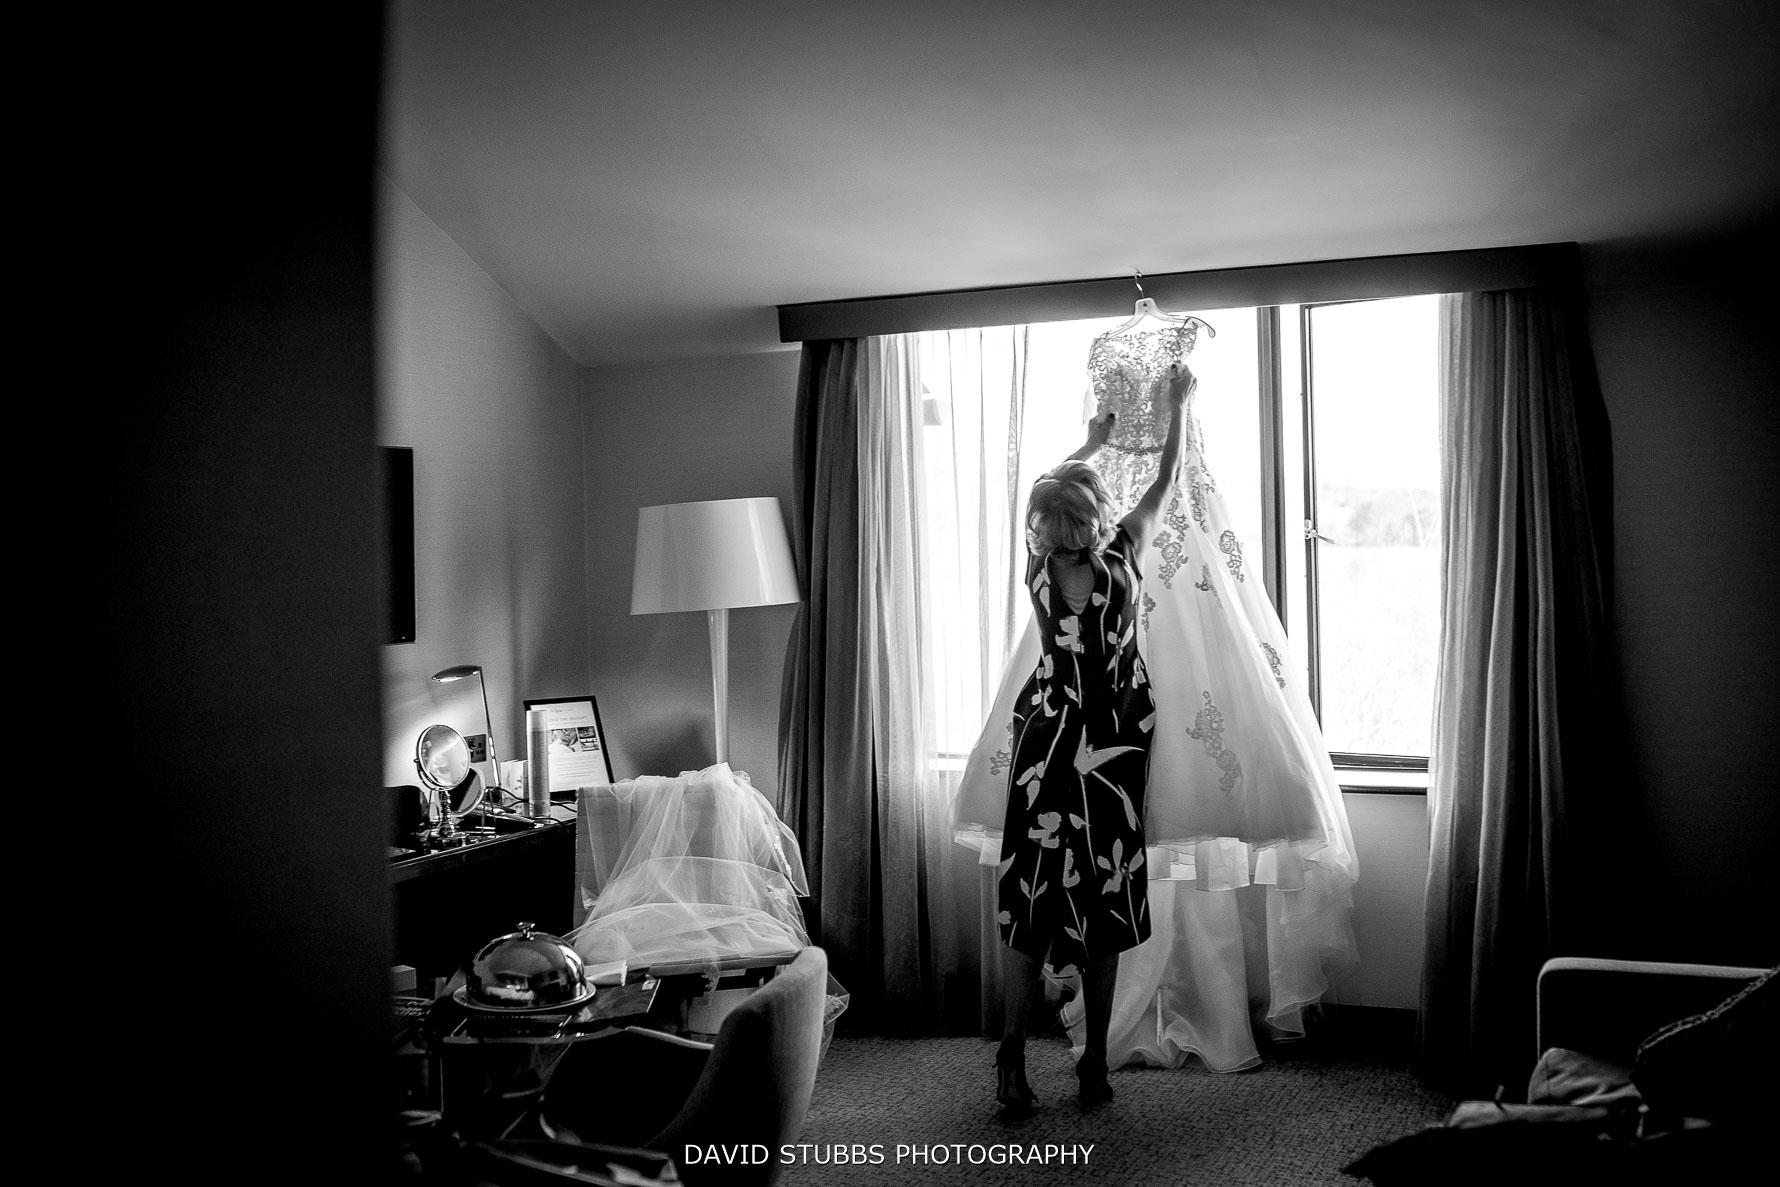 taking the wedding dress down